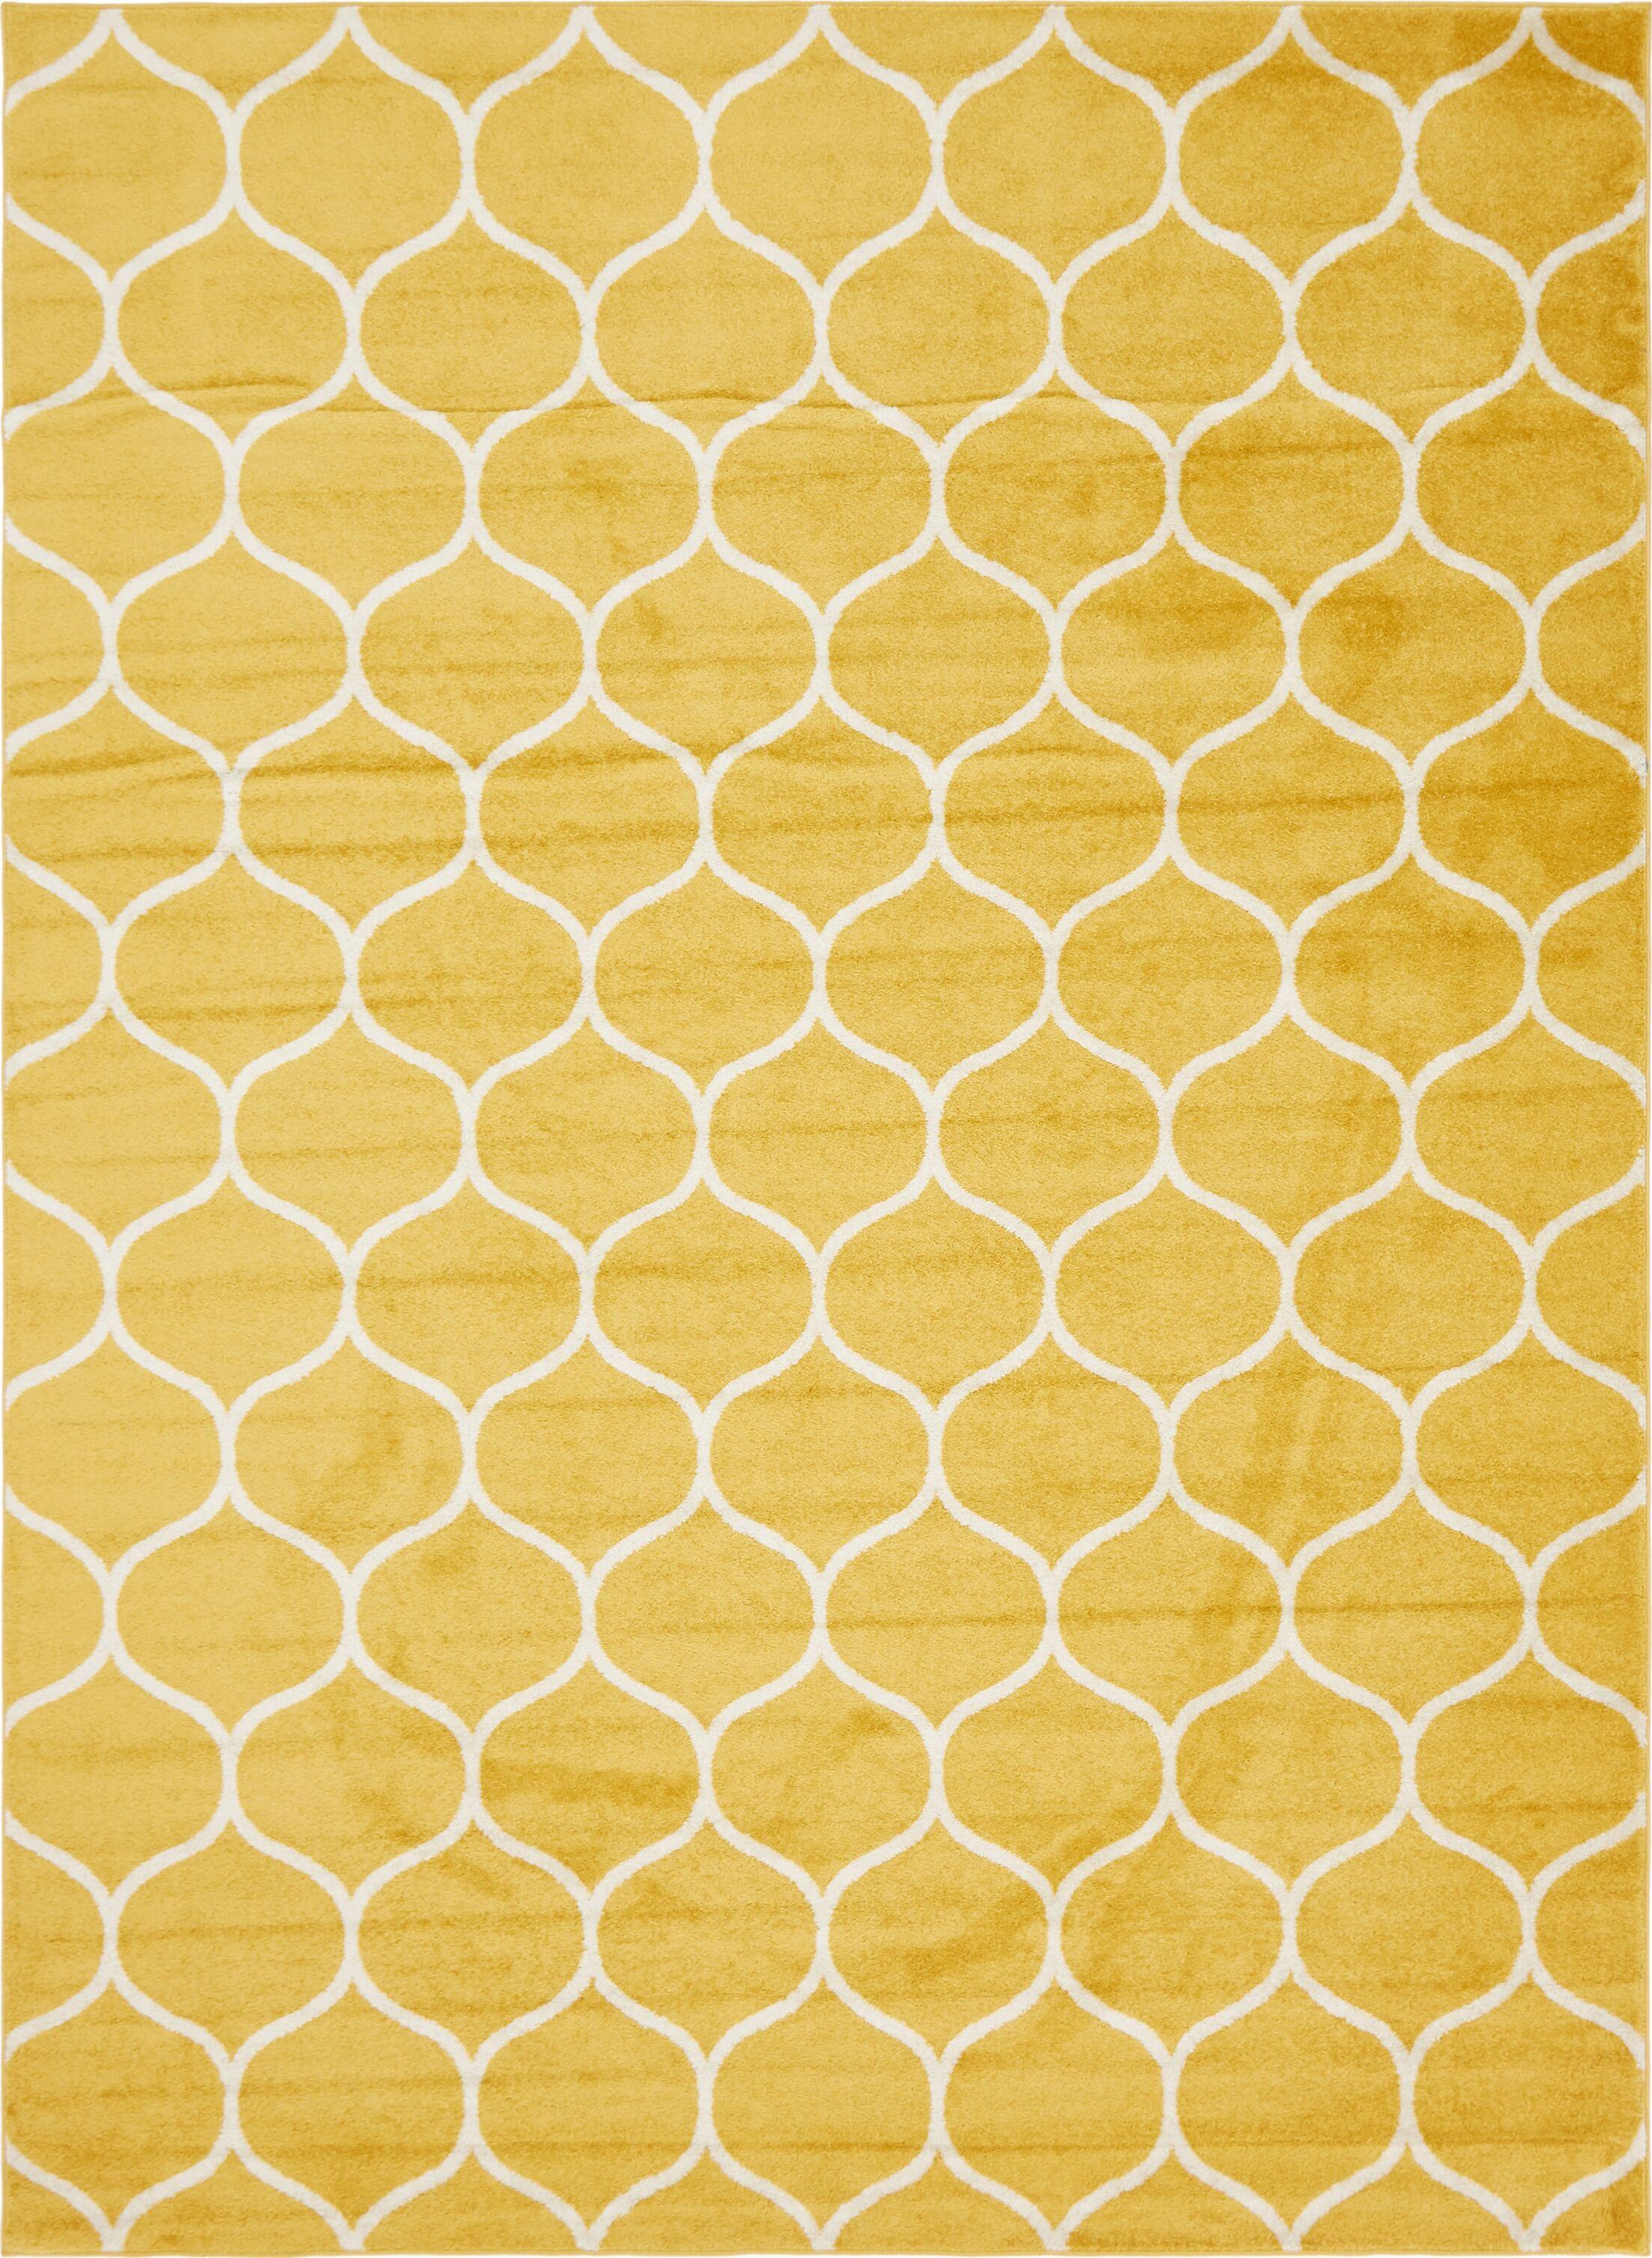 Easter Compton Trellis Yellow Area Rug Rug Size: Rectangle 9' x 12'